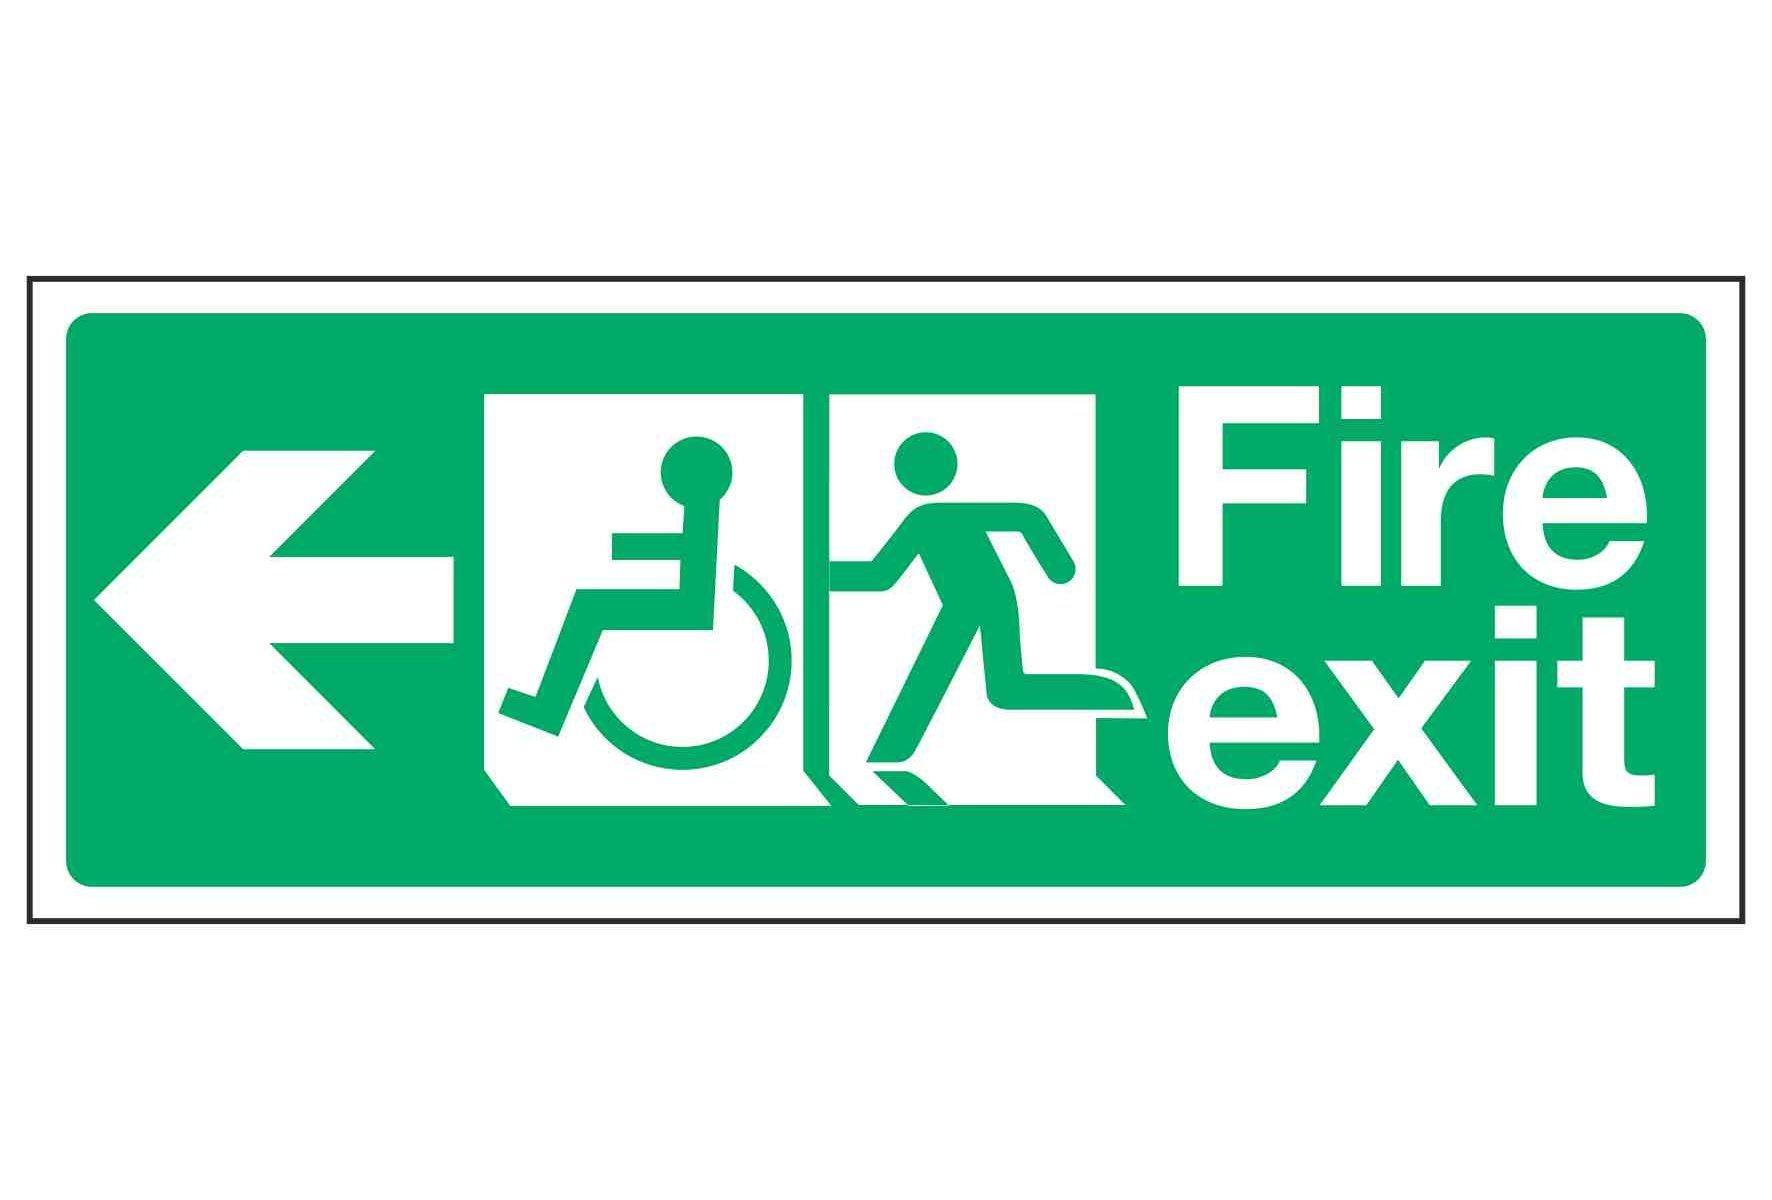 Fire exit / Disabled (Arrow left)